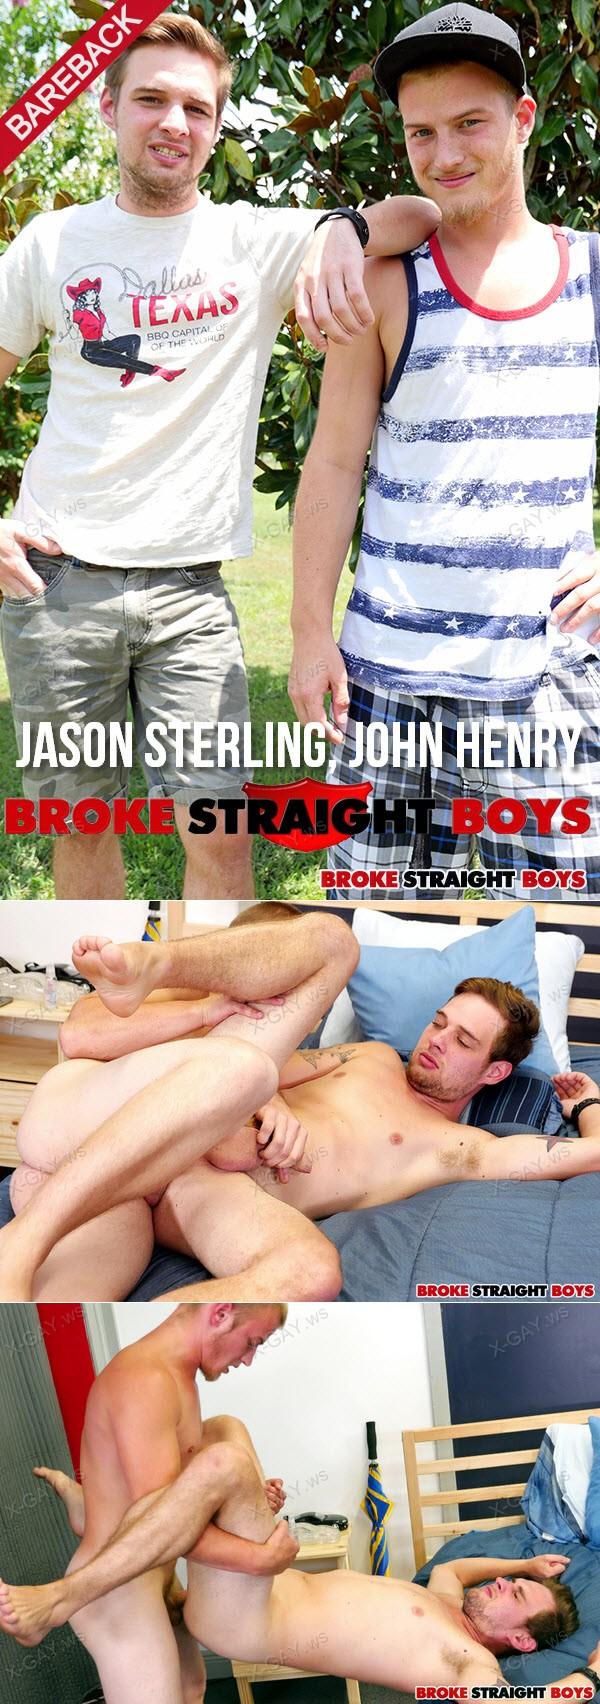 BrokeStraightBoys: Jason Sterling, John Henry (RAW)